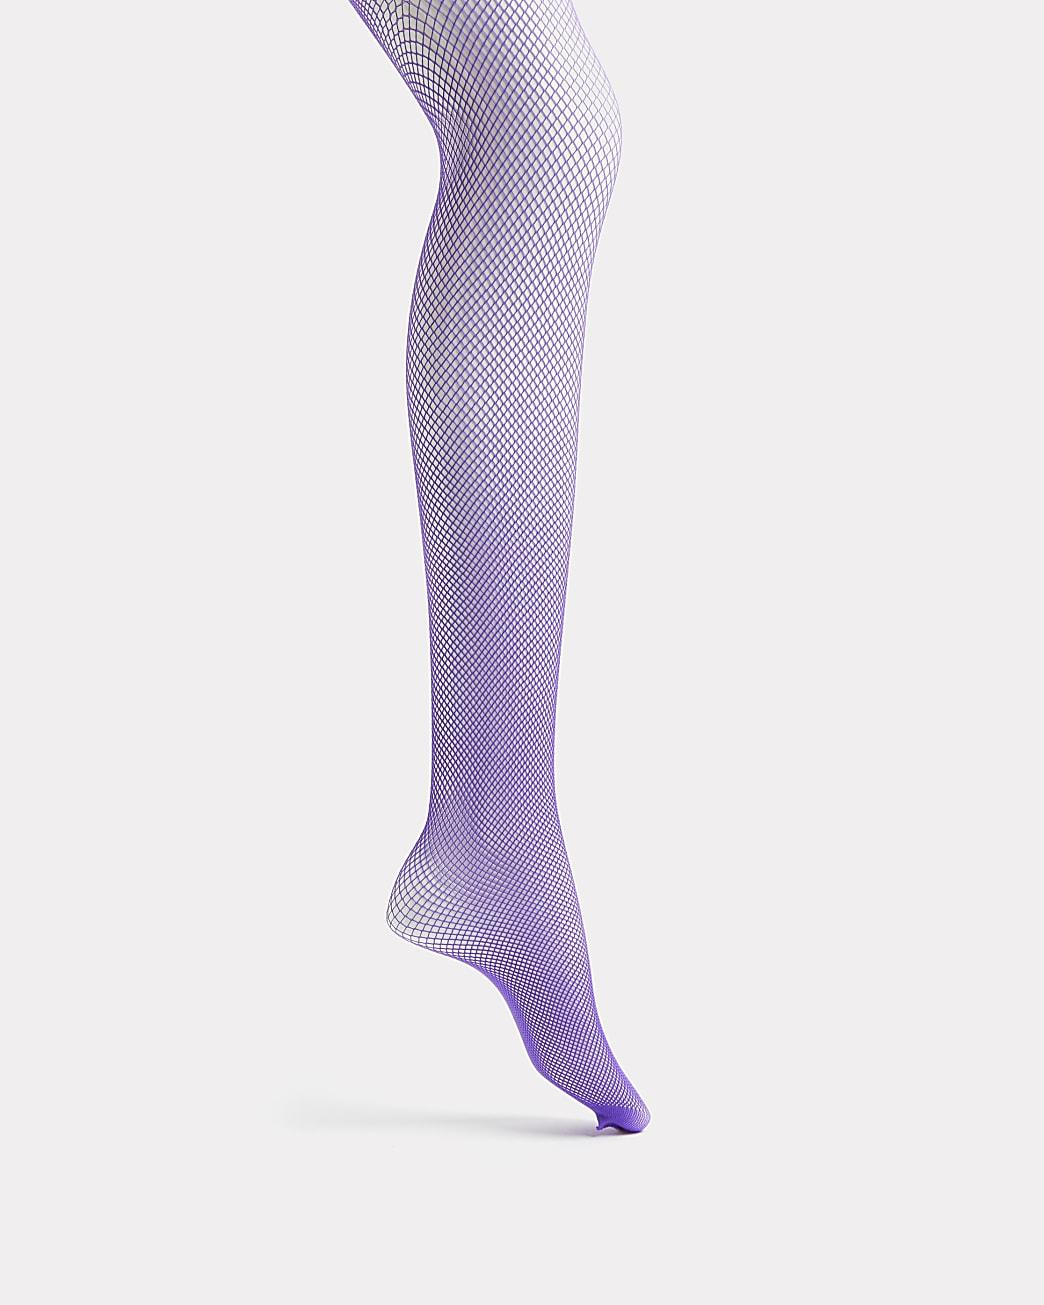 Purple neon fishnet tights